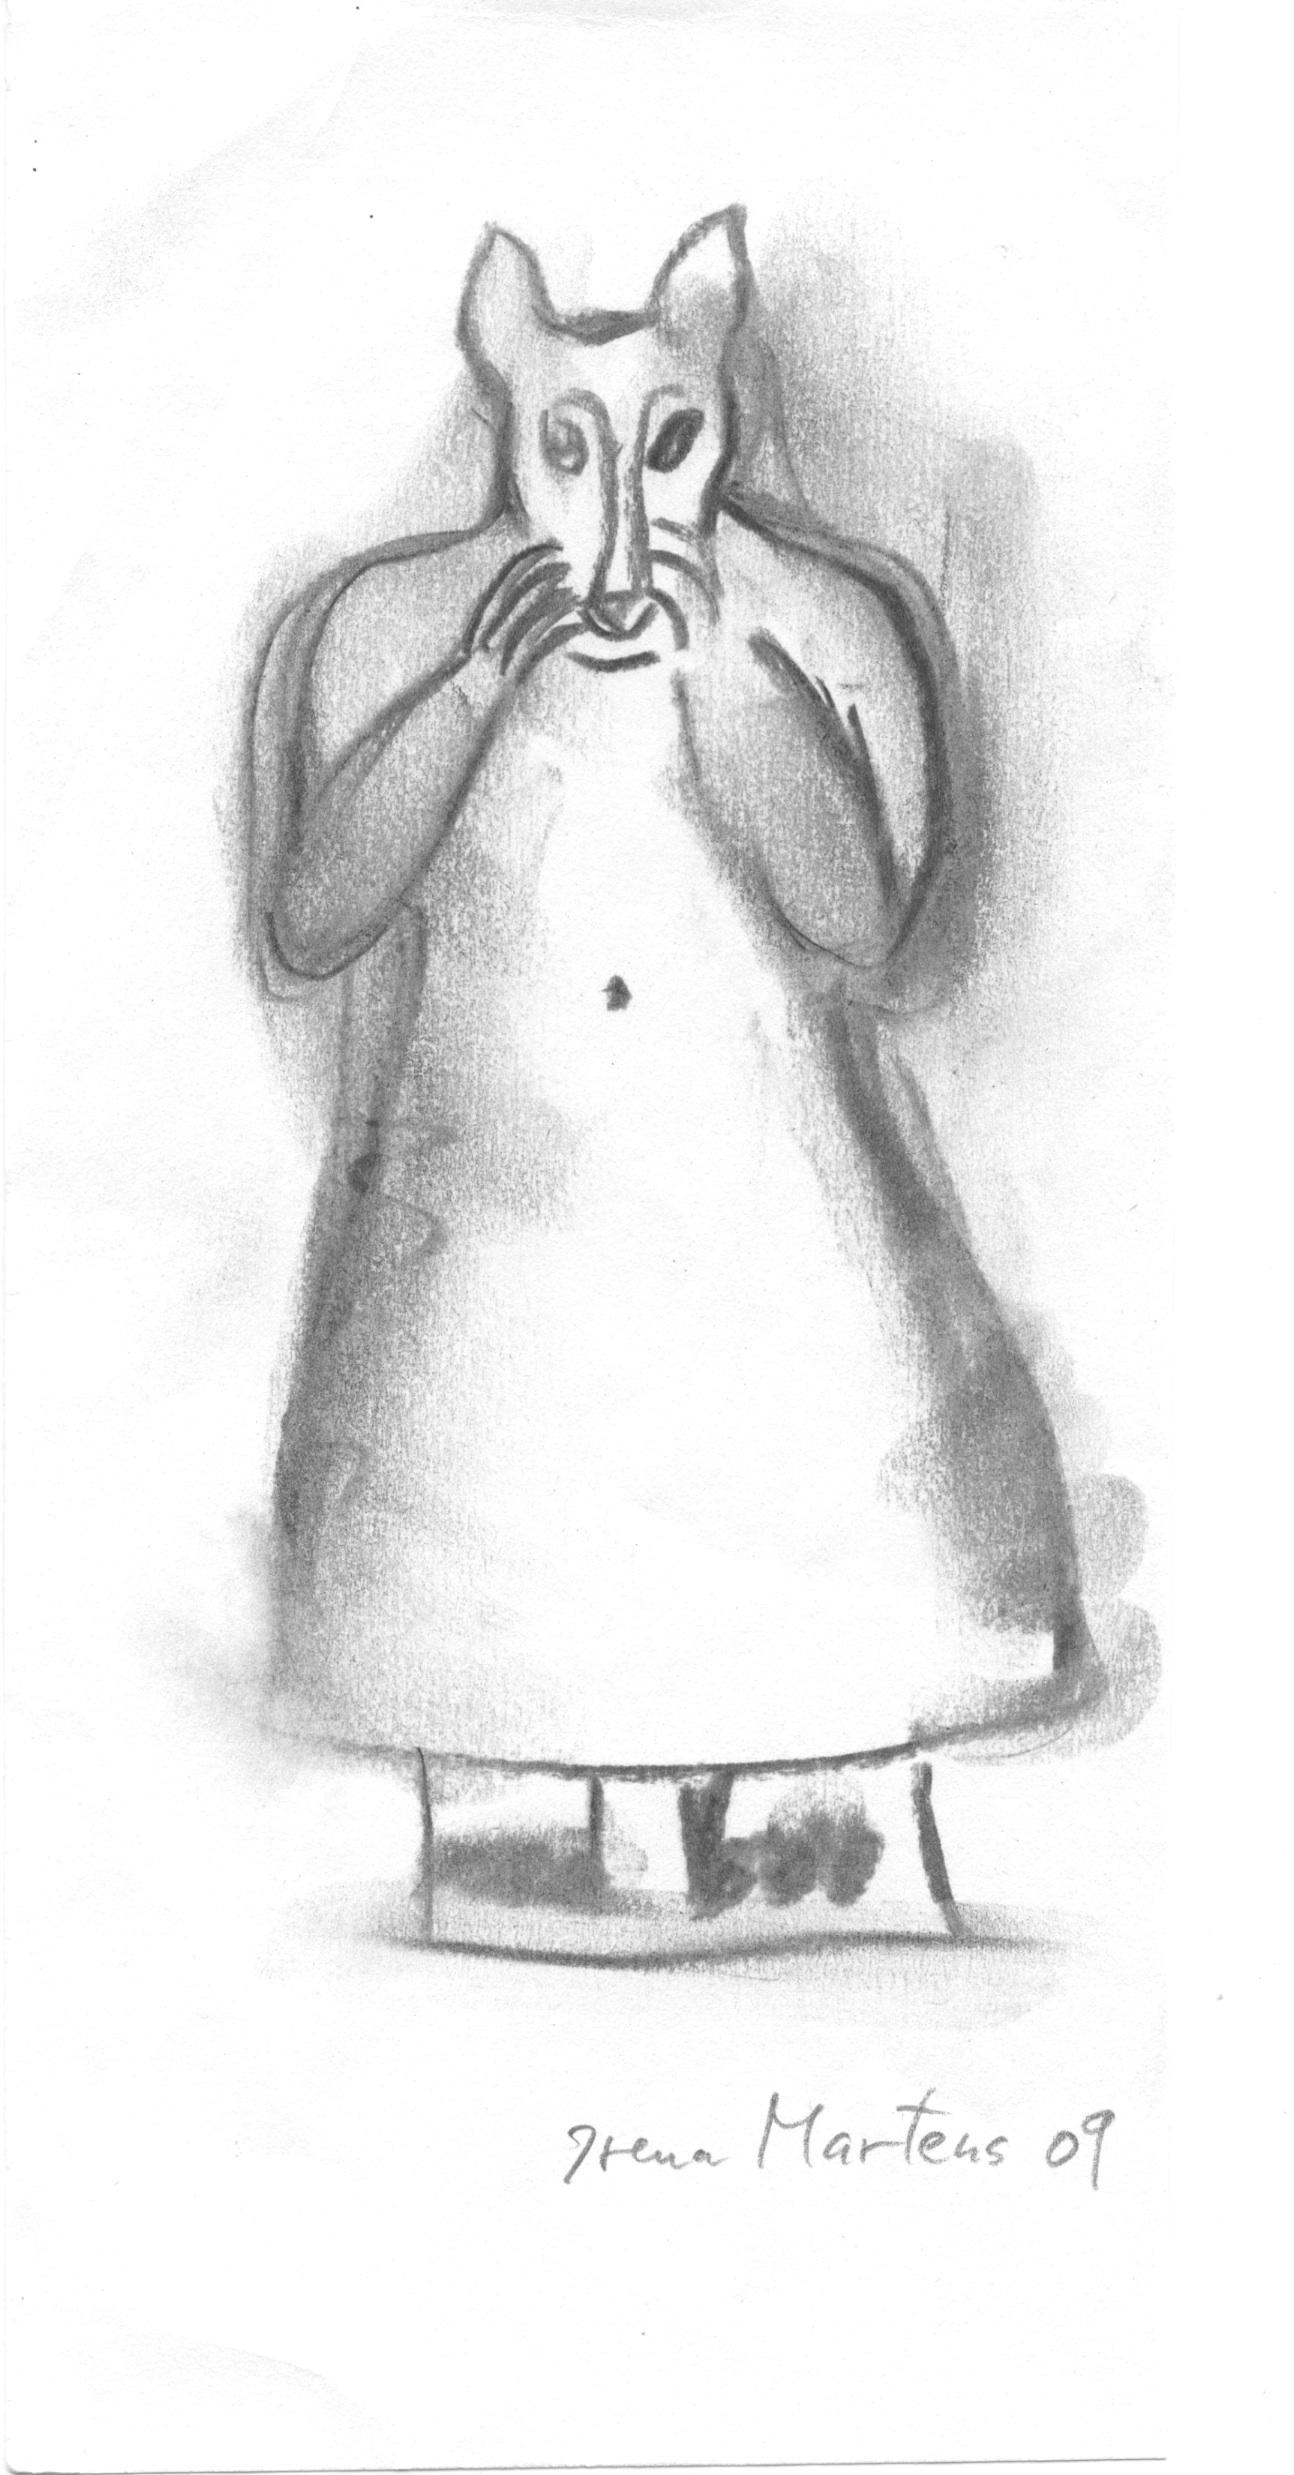 charcoal-drawing-met-1-2009